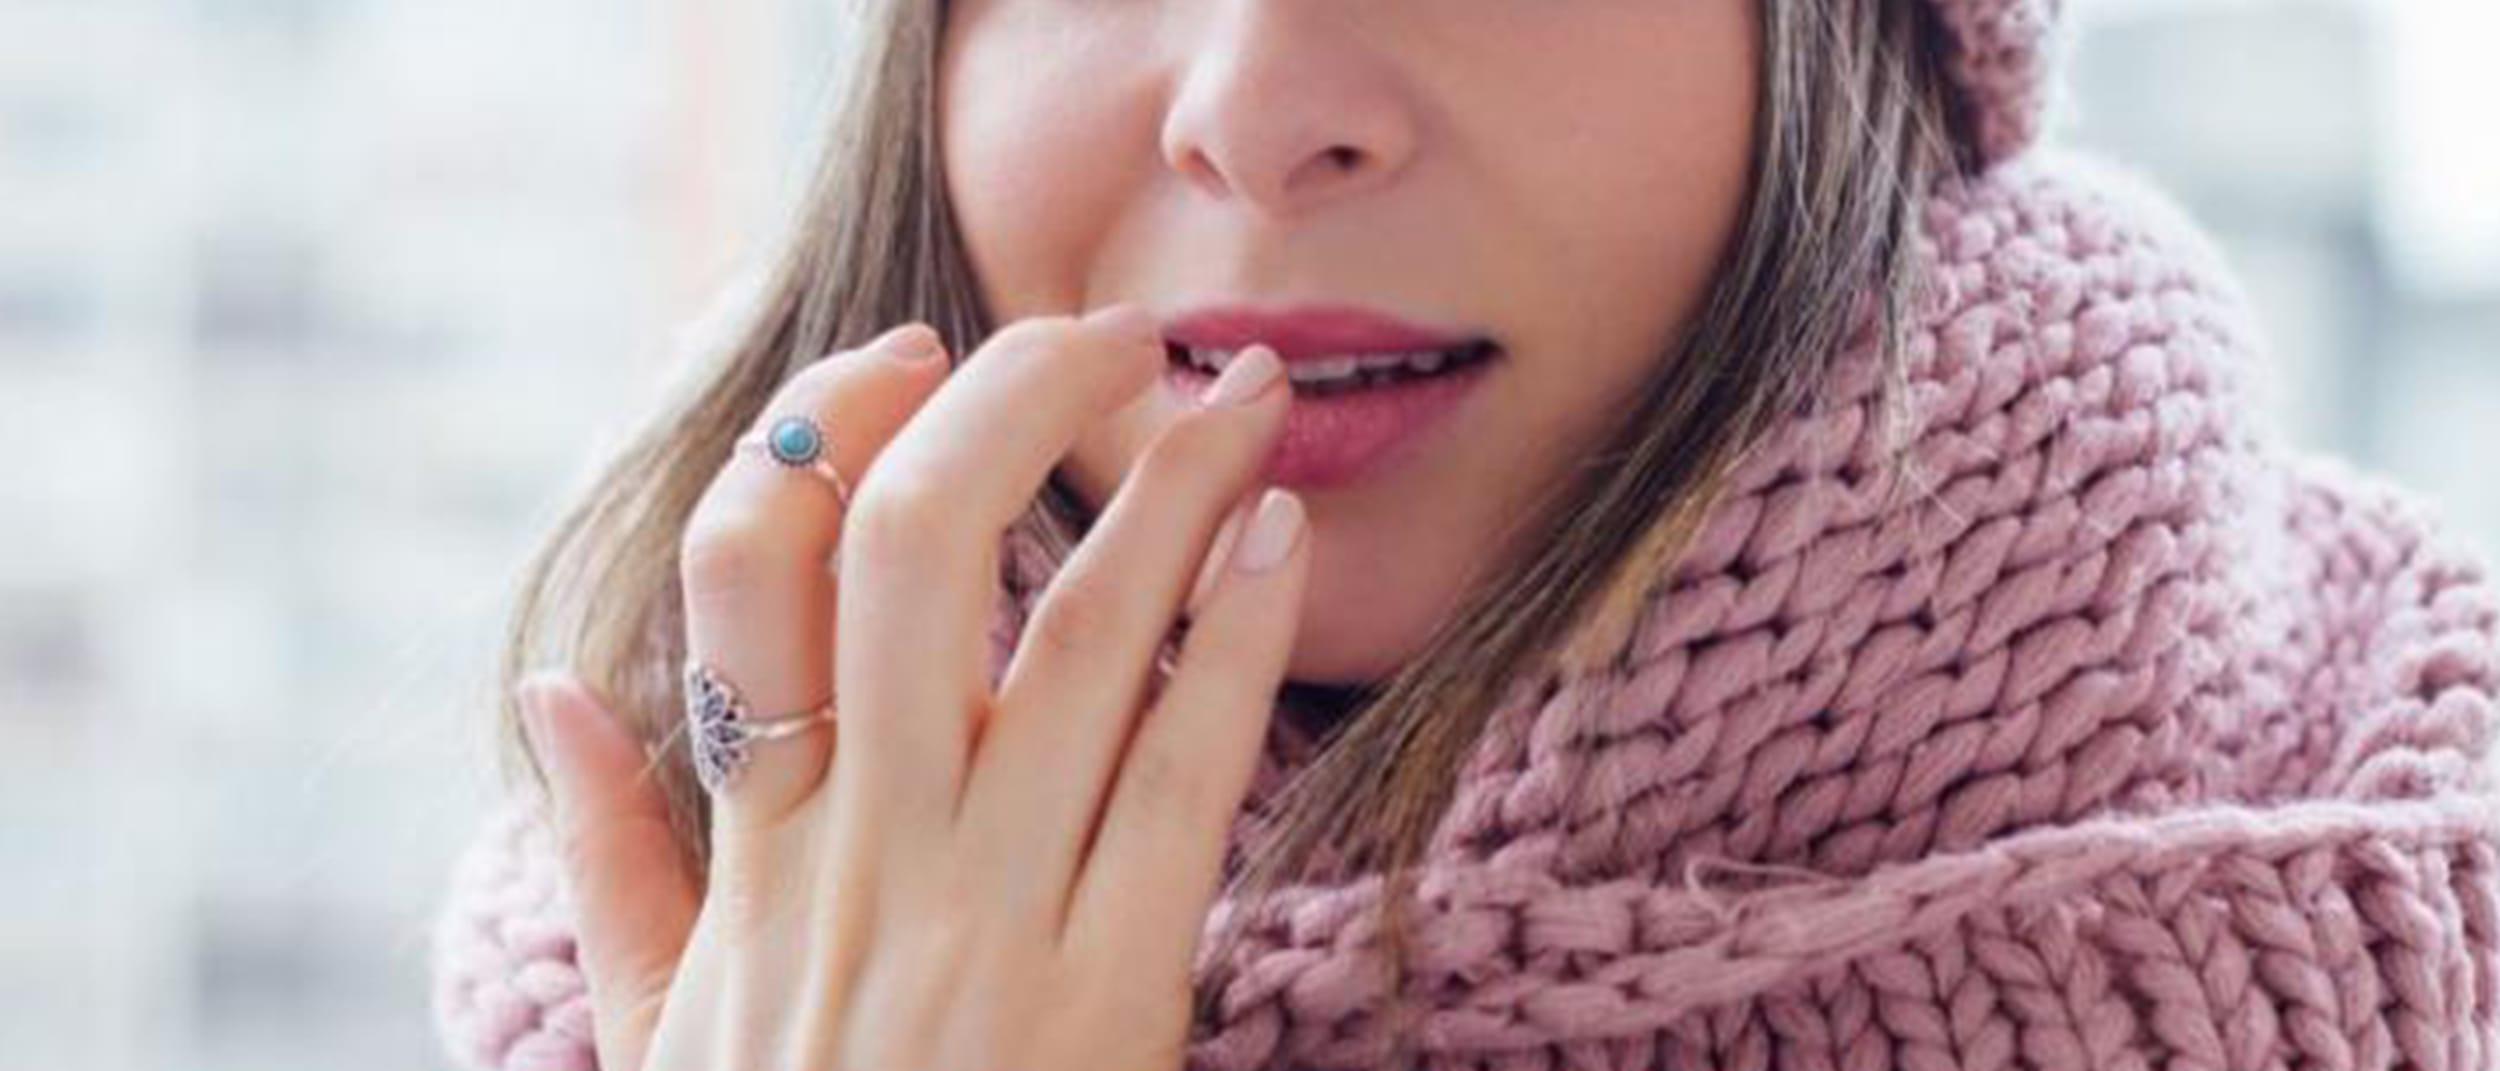 Nirvana Beauty Laser Clinics: 10 winter beauty mistakes